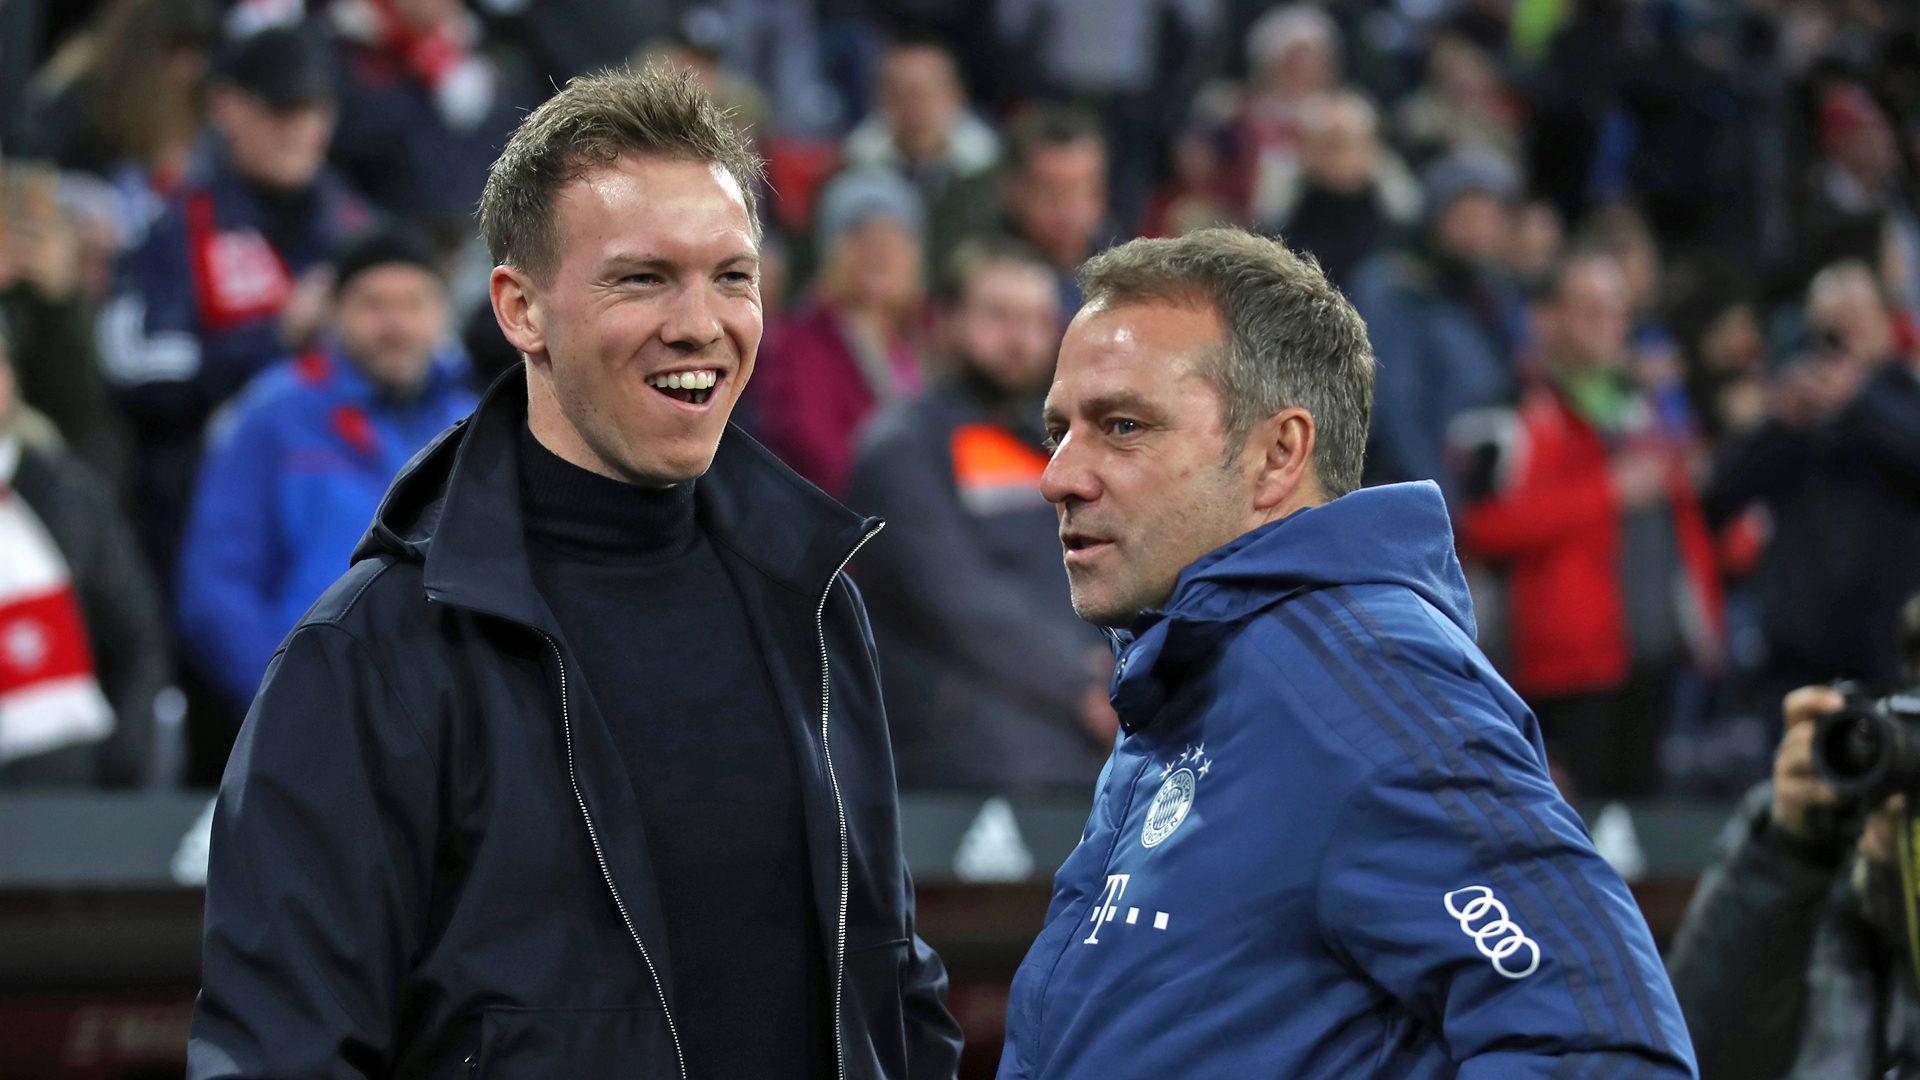 Bundesliga | Bayern Munich name RB Leipzig's Julian Nagelsmann as Hansi Flick's successor